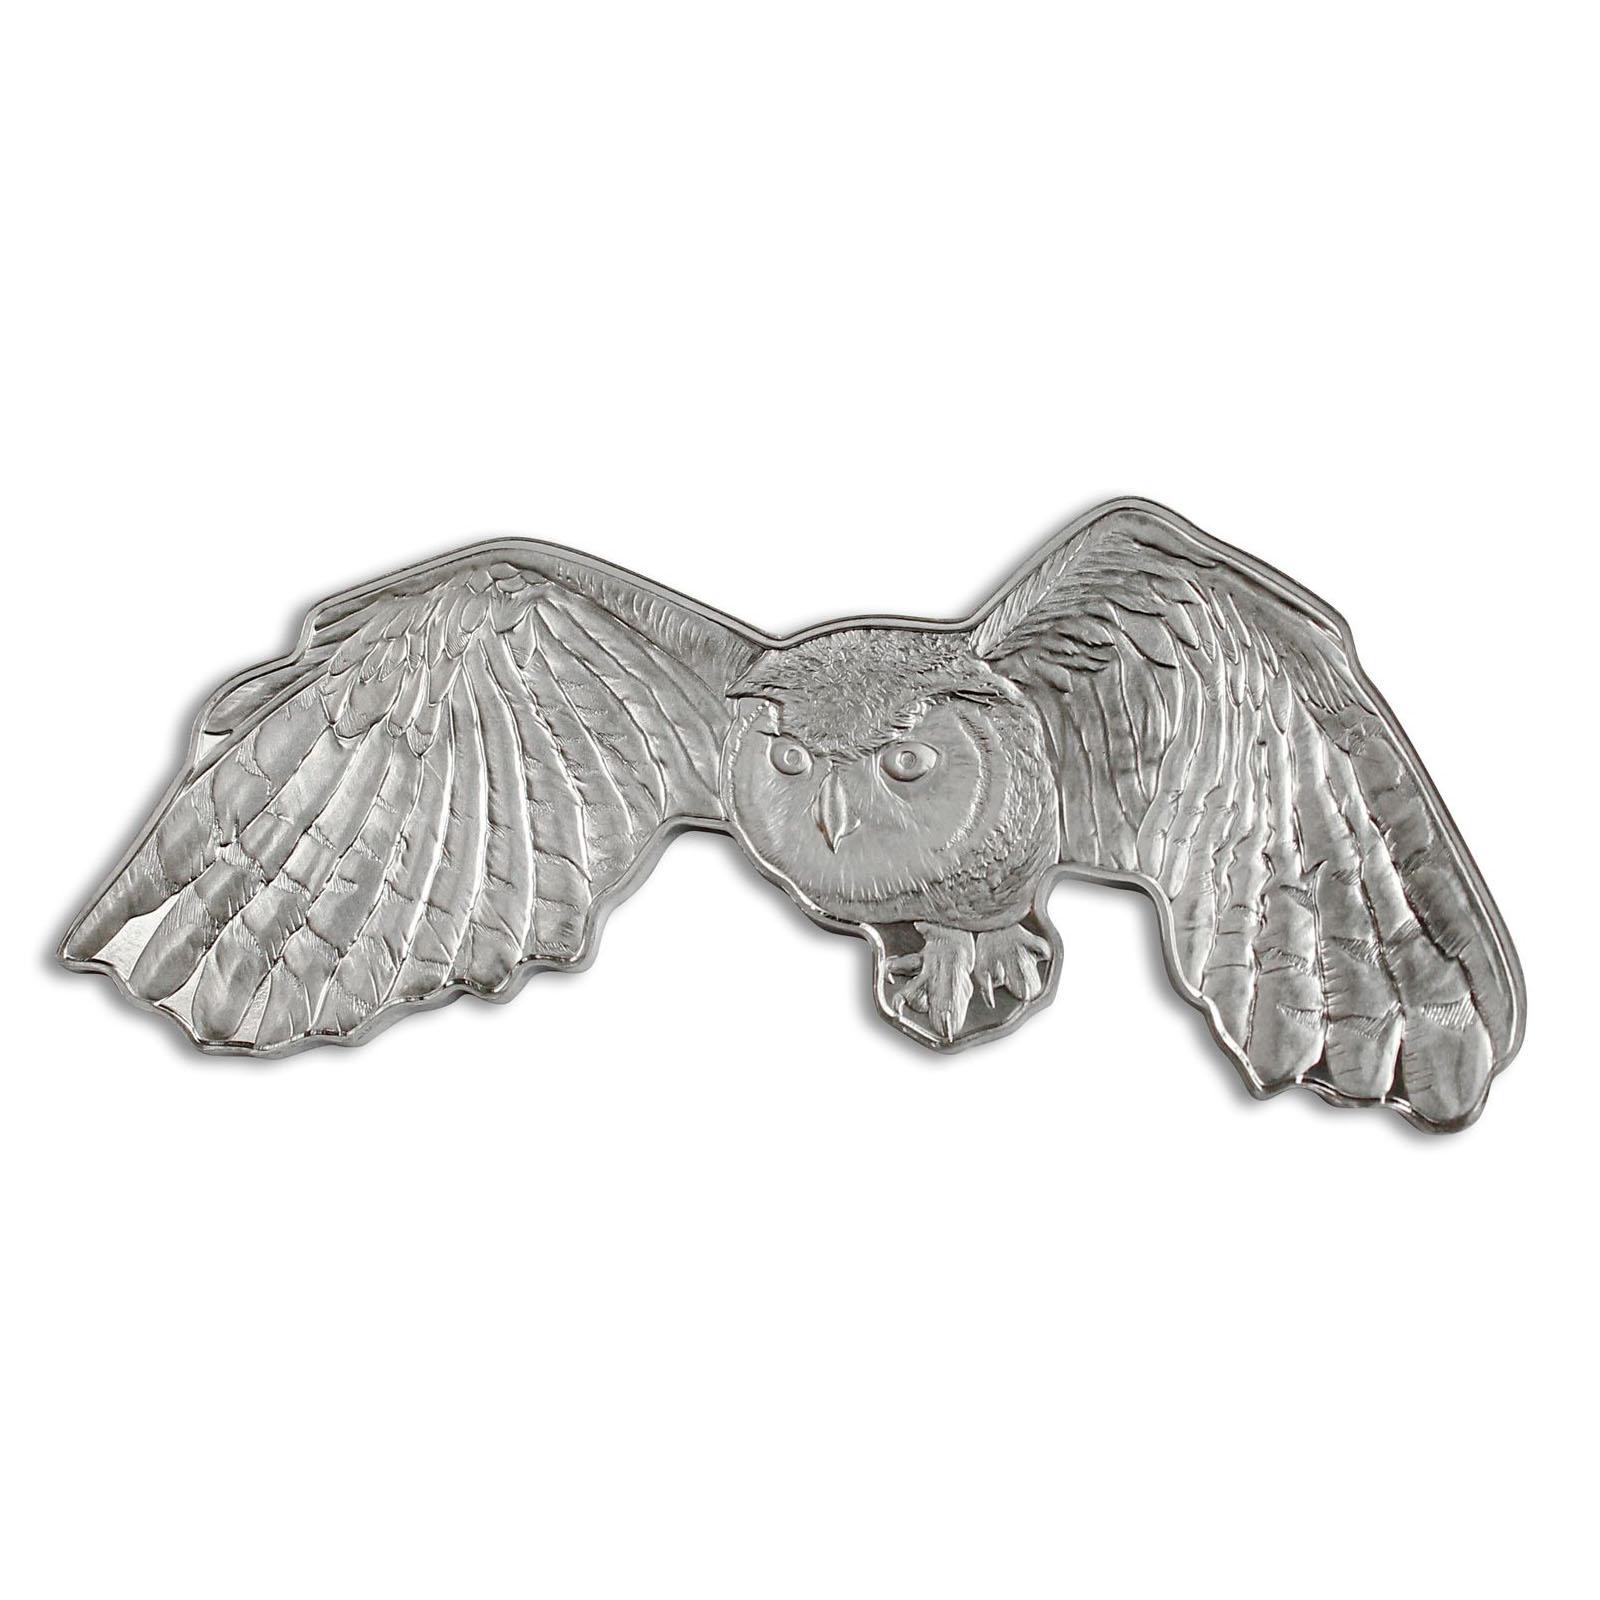 2020 Great Horned Owl Solomon Islands 1oz Silver $2 Coin .9999 Fine